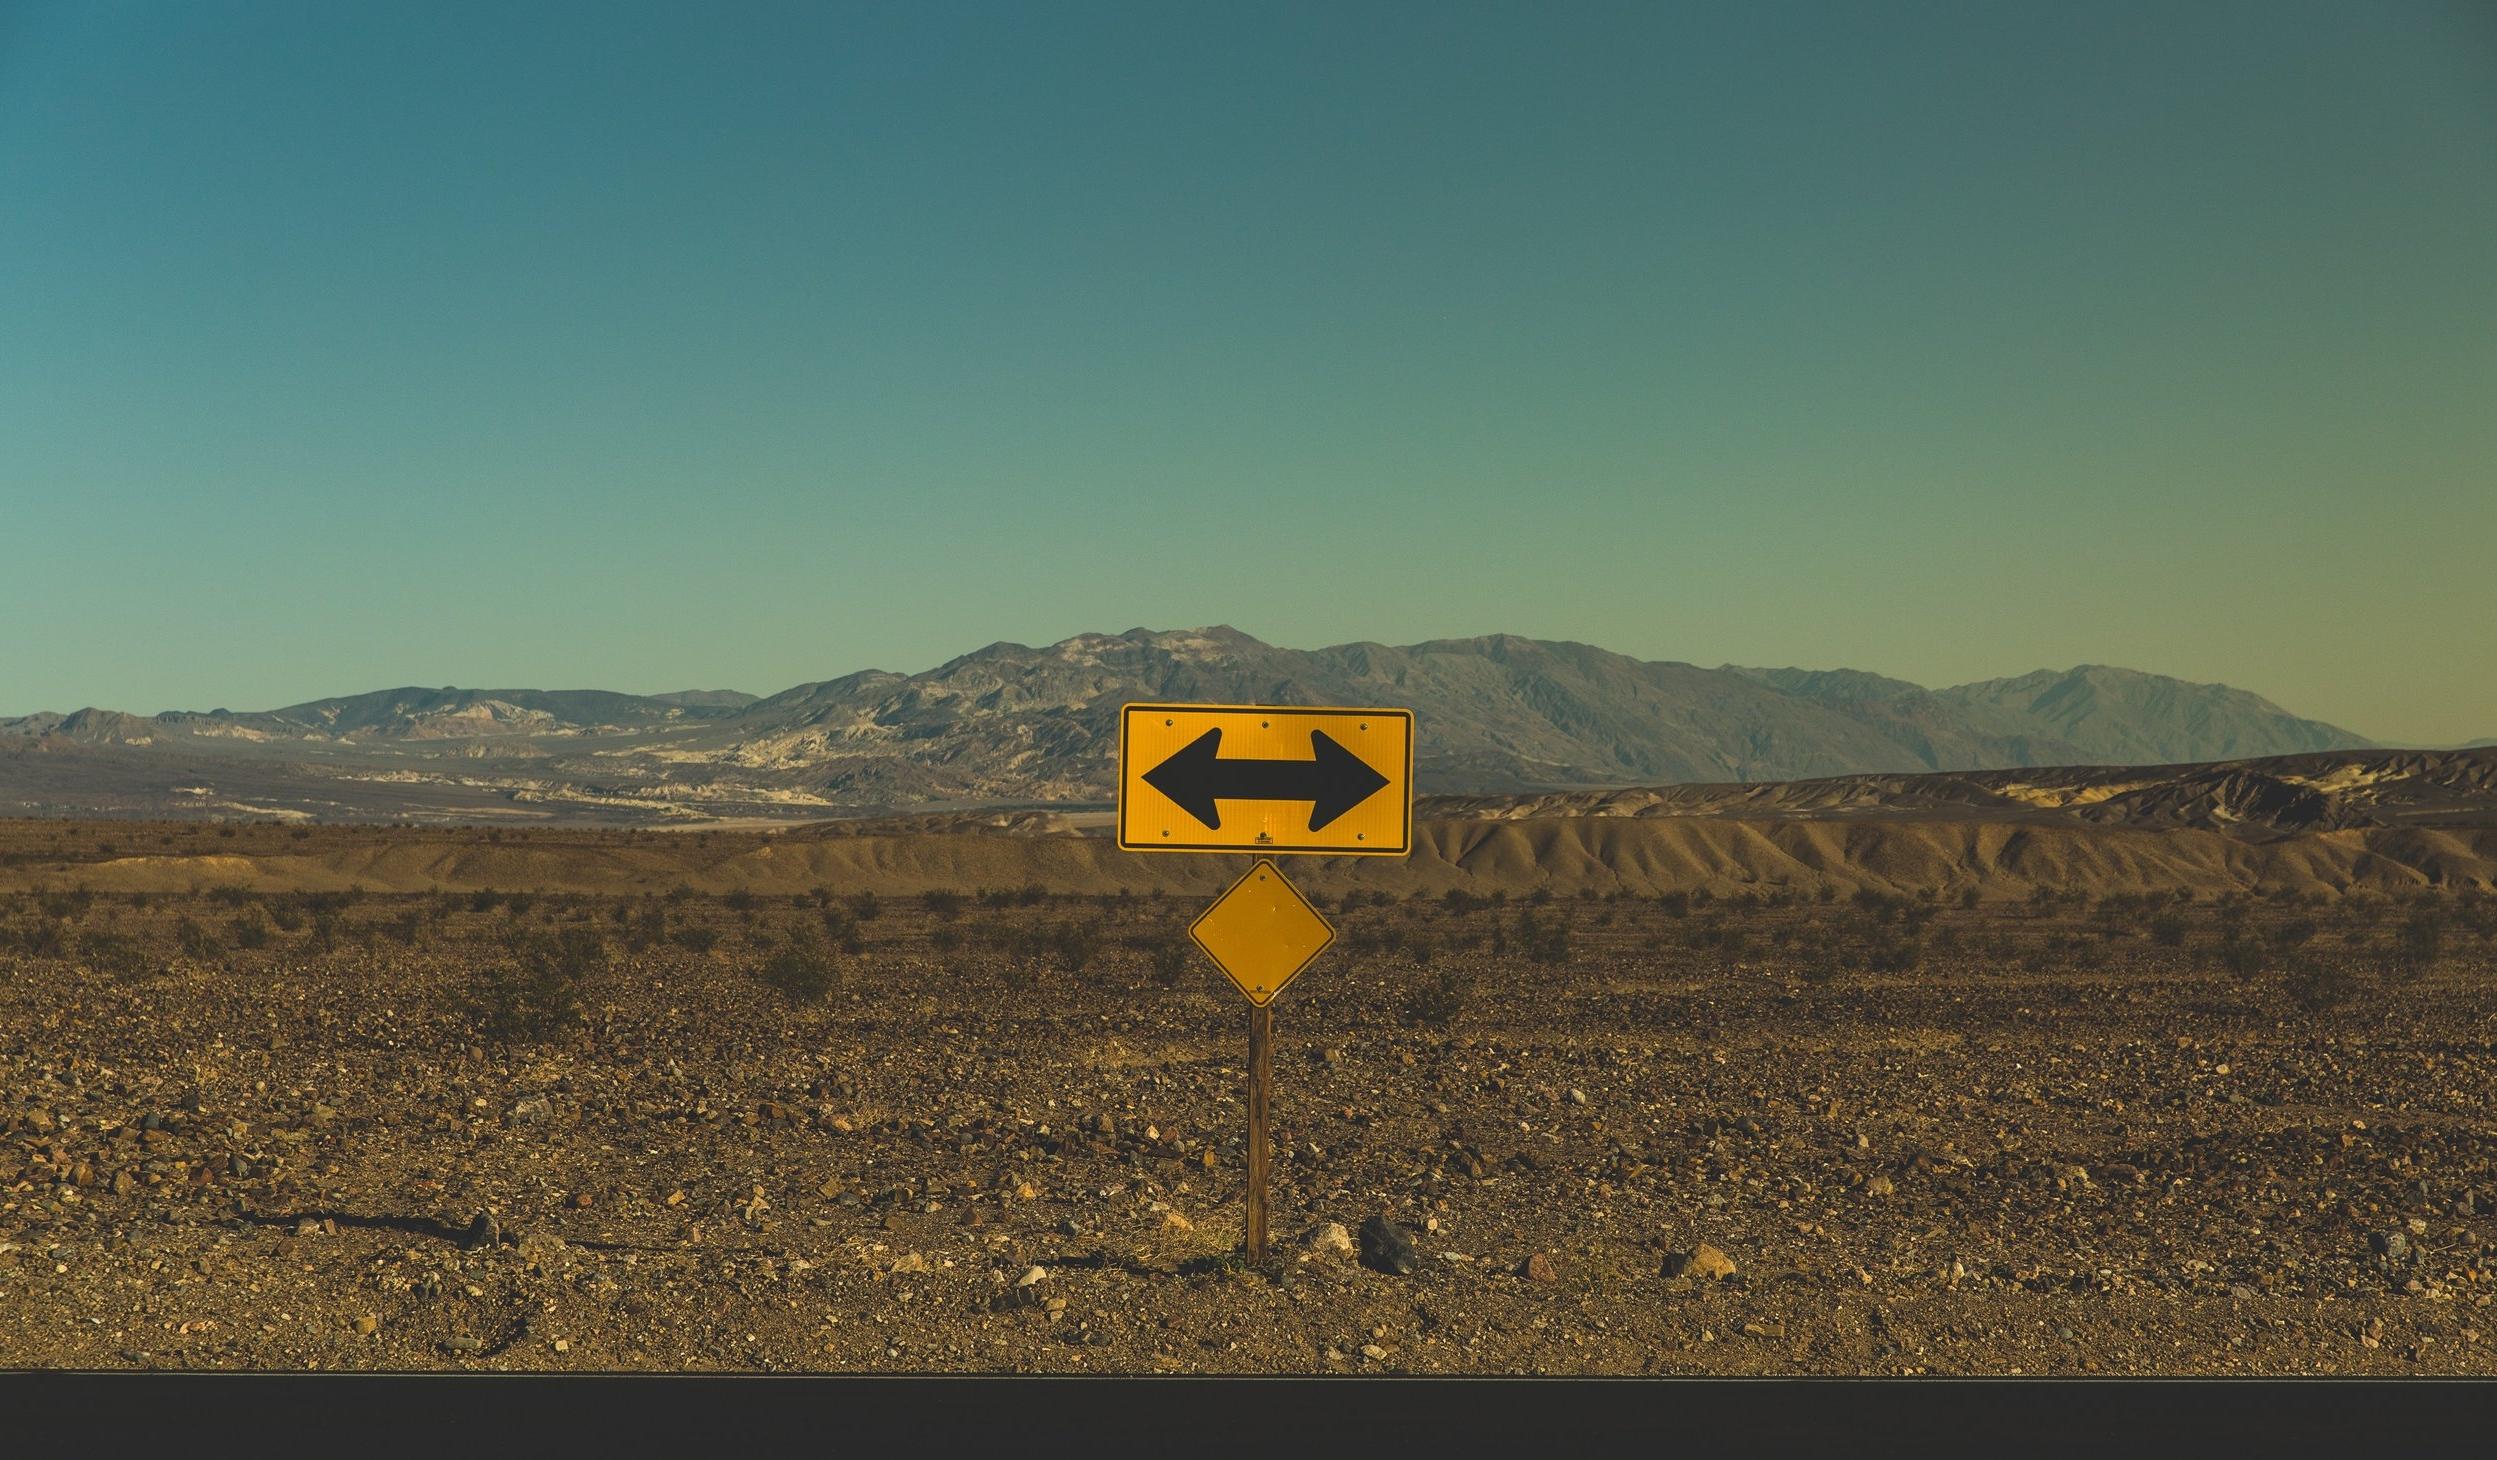 relationship doubts arrow road sign.jpg